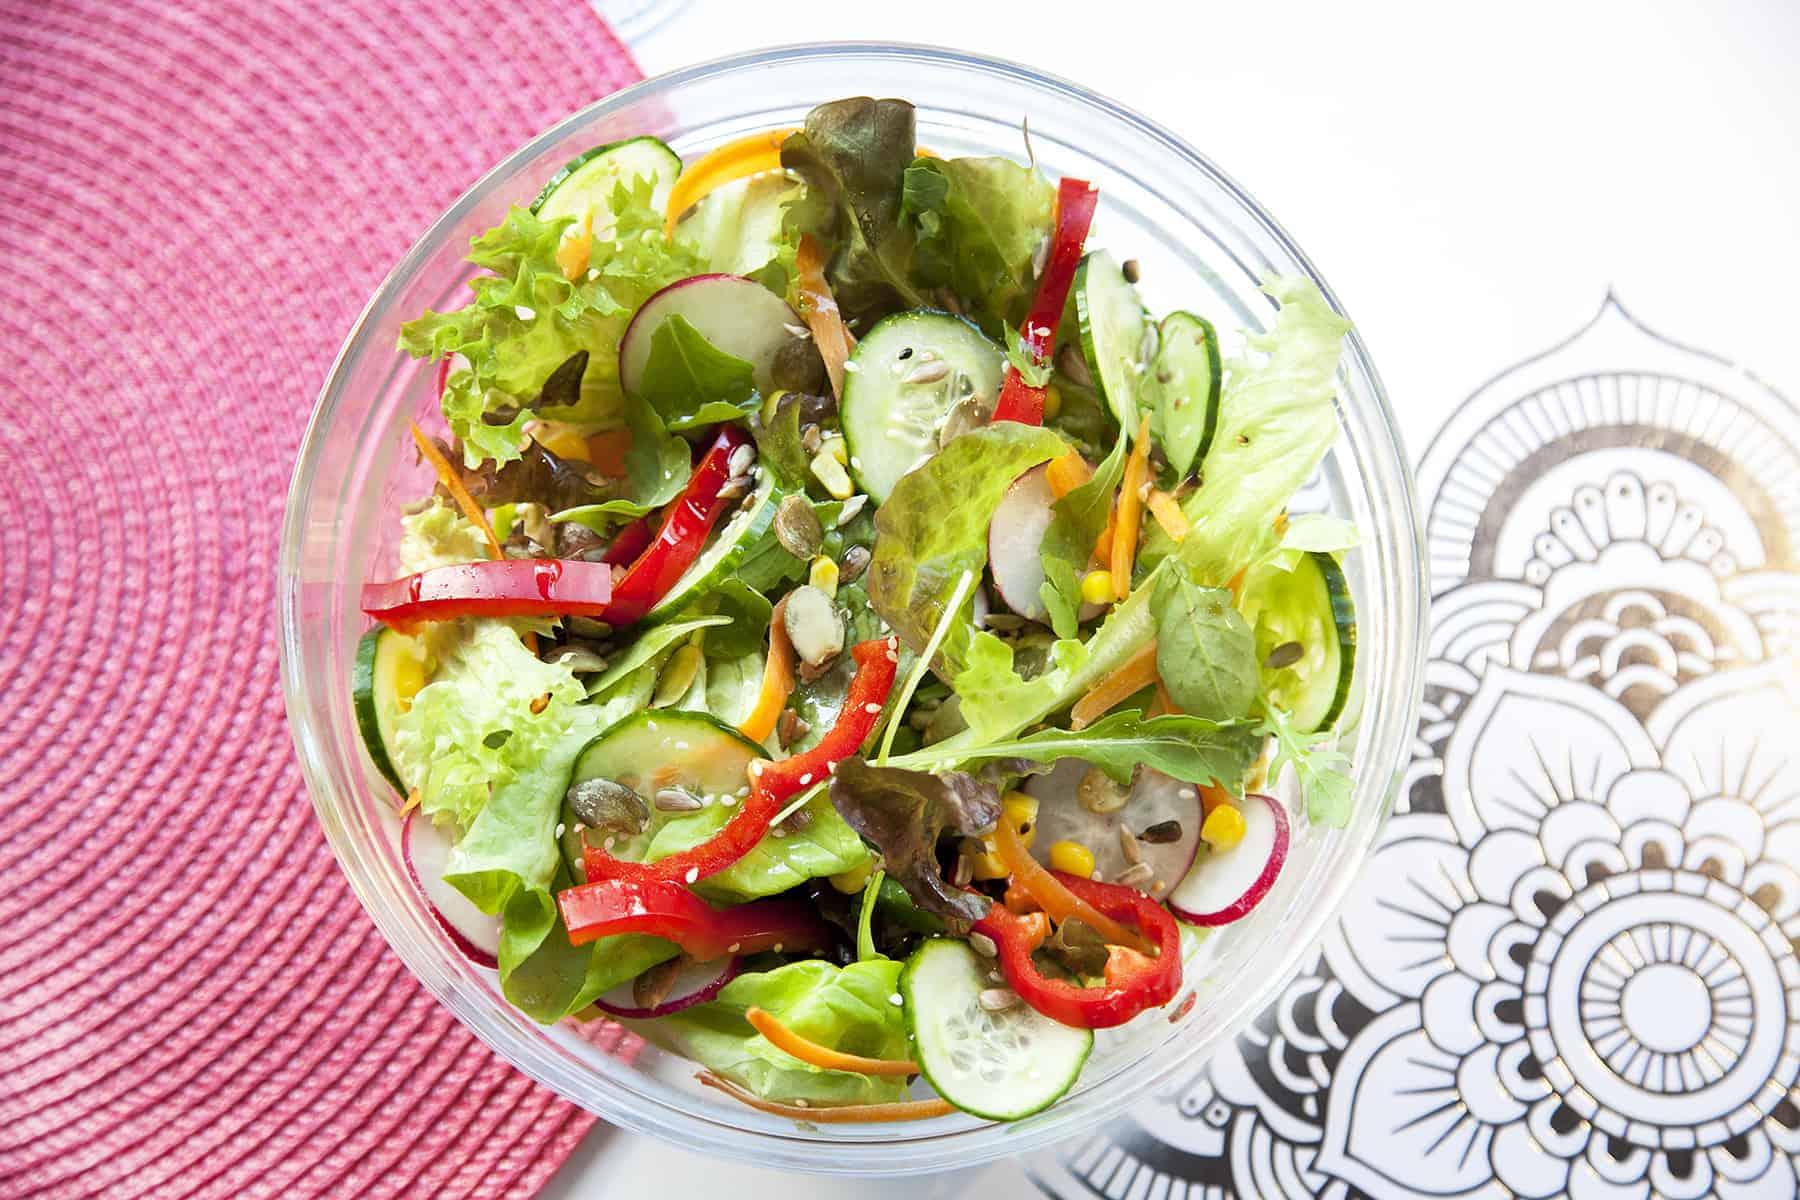 vegan-tavaszi-salatab-napfenyes-cukraszat